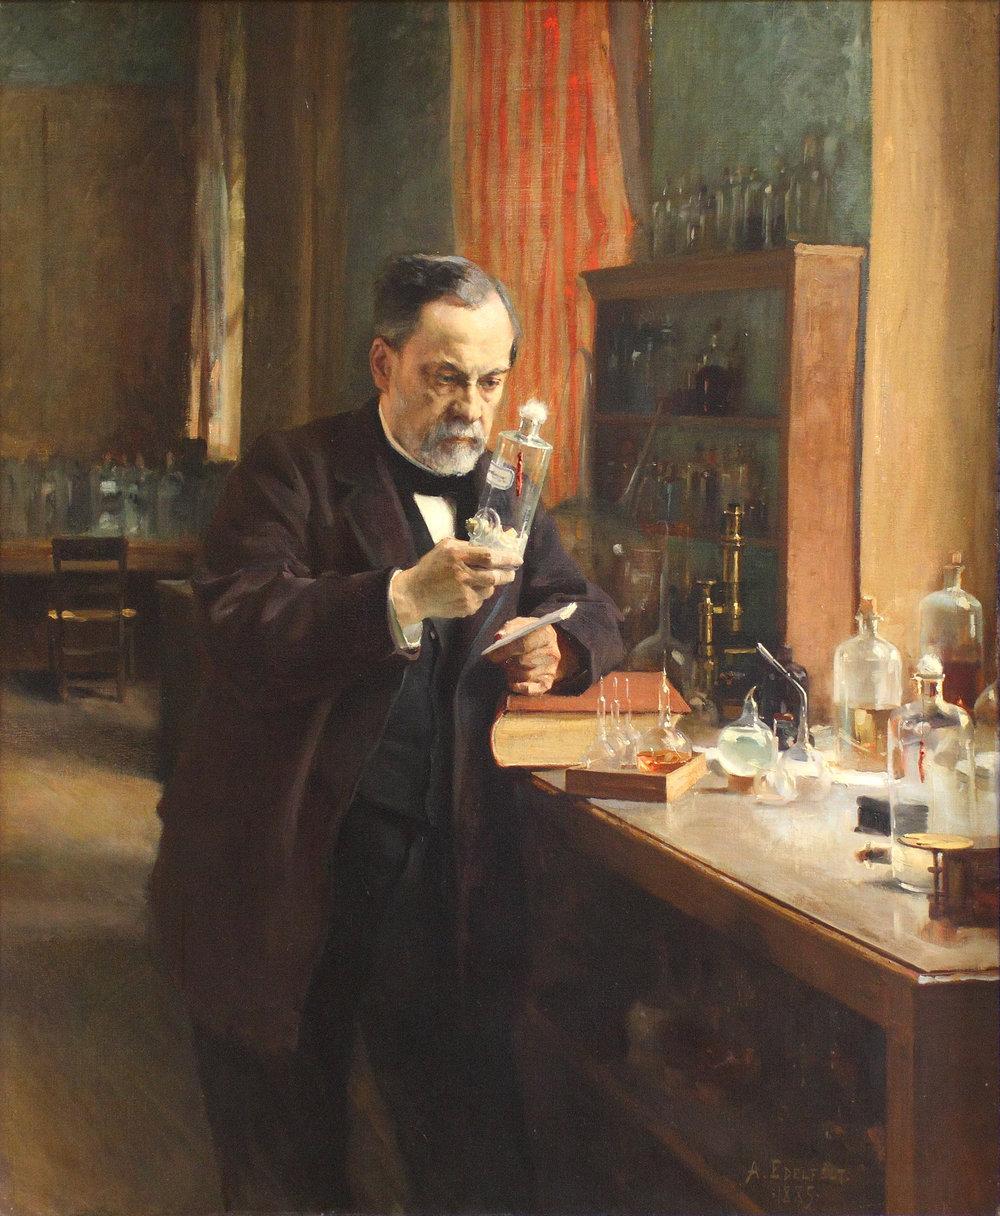 Louis Pasteru'ün laboratuvarı